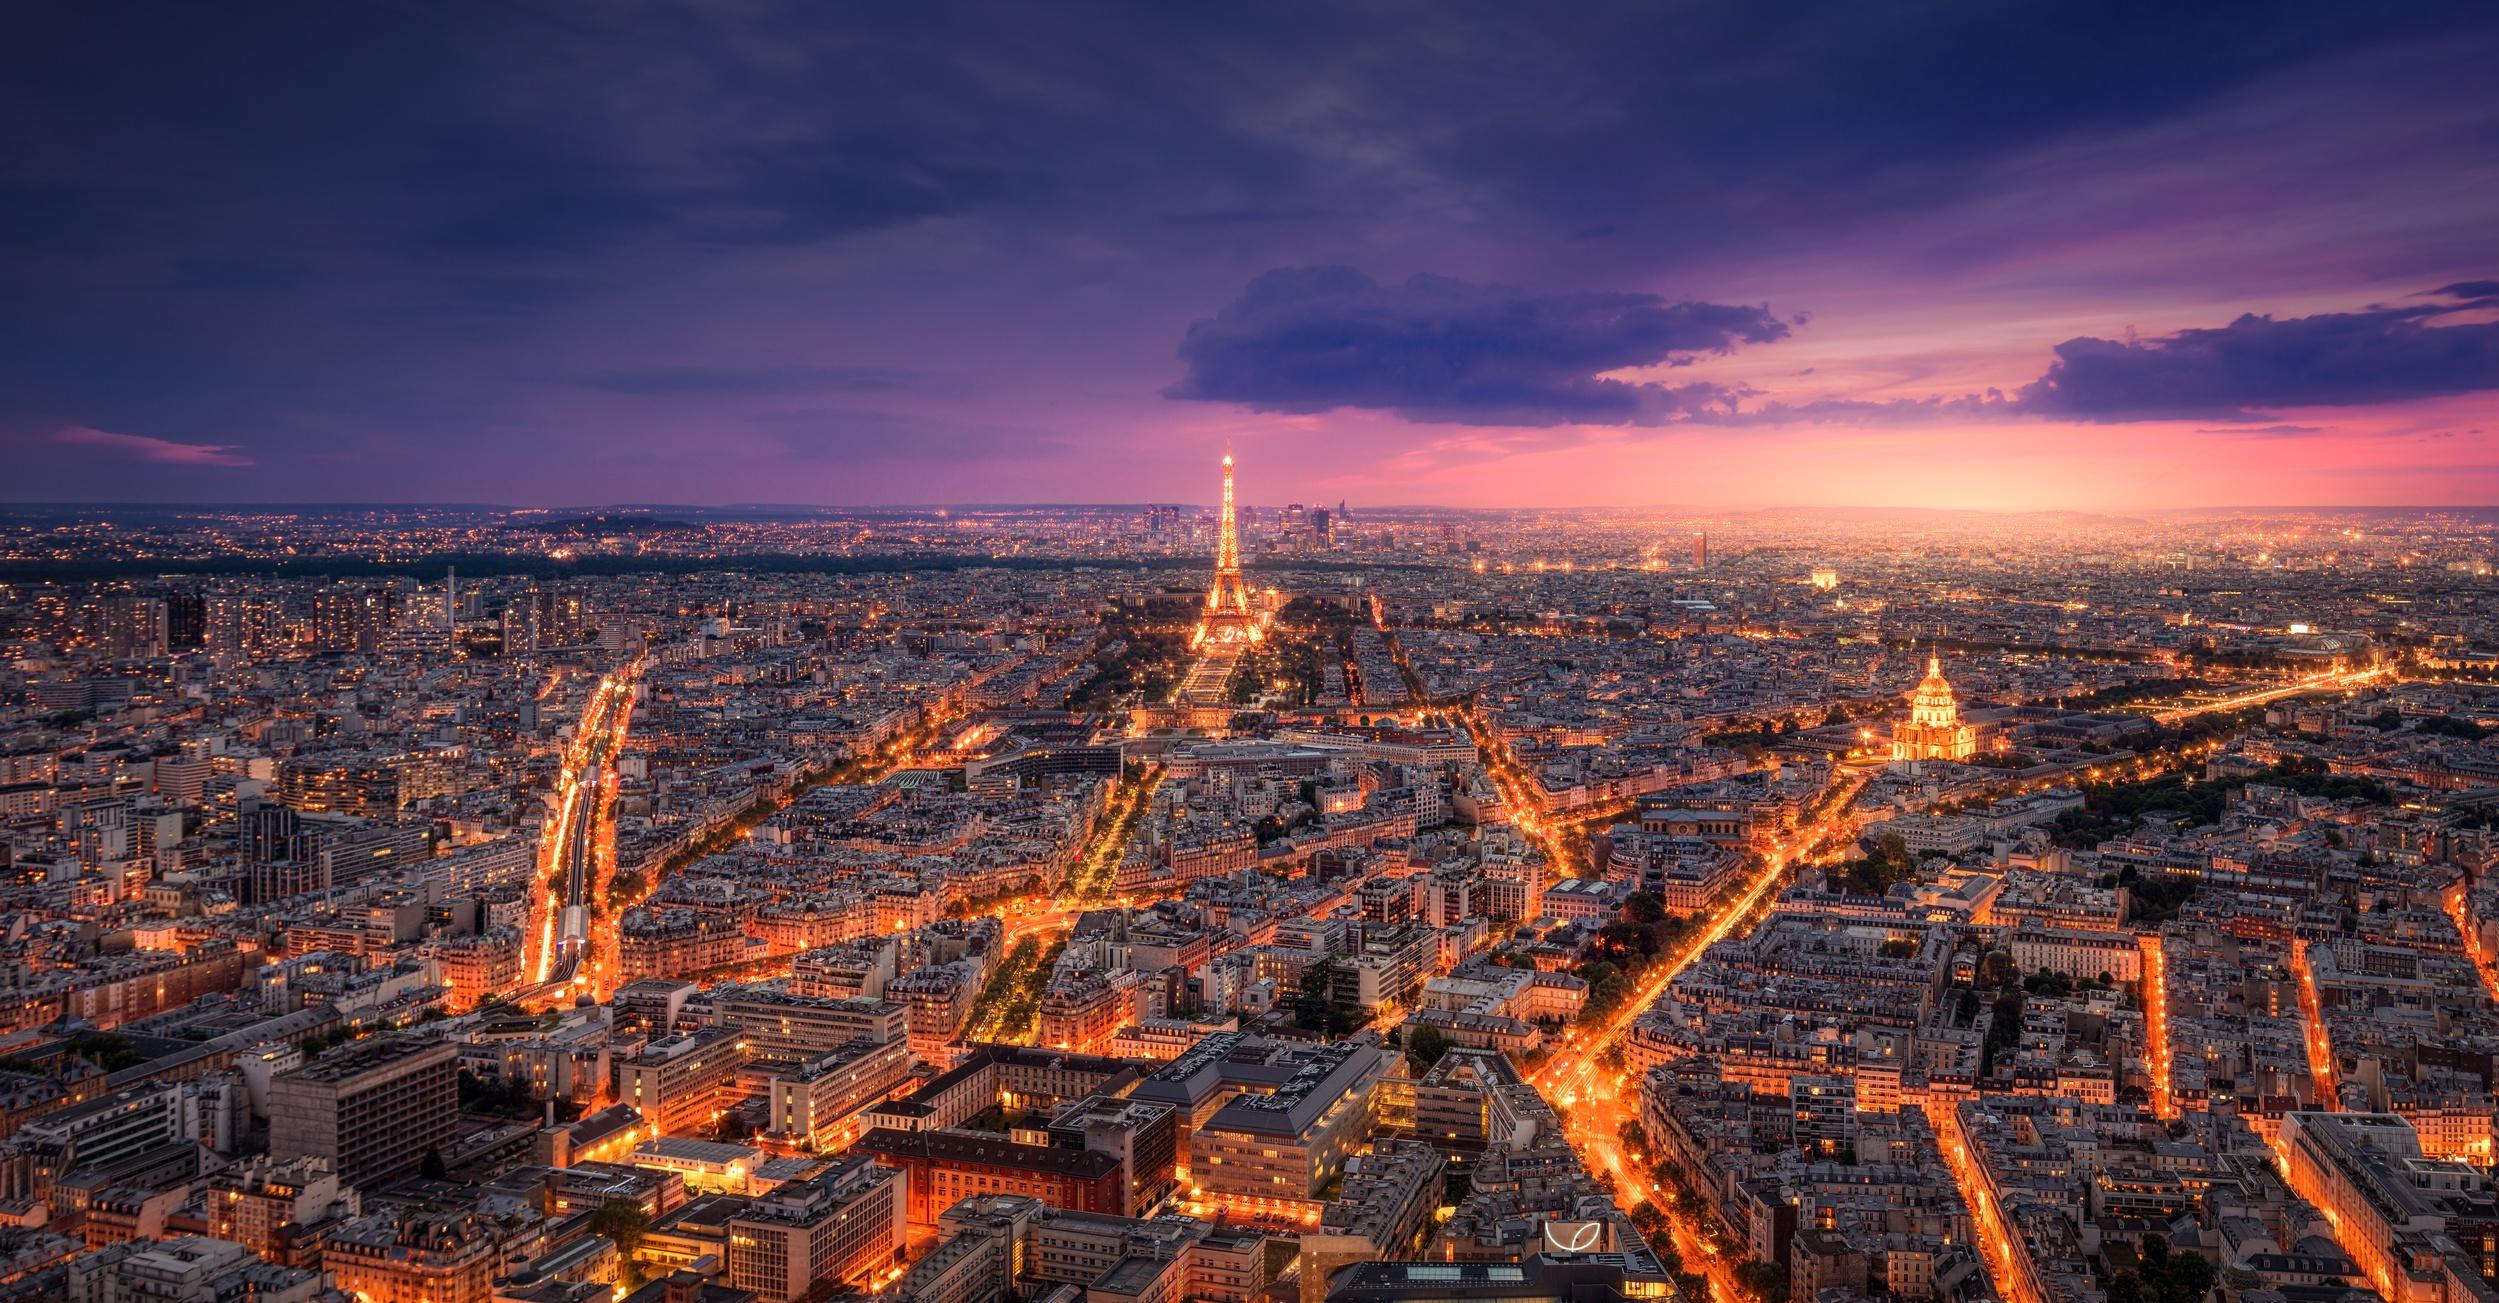 Light City France Eiffel Tower Cityscape 2499x1303